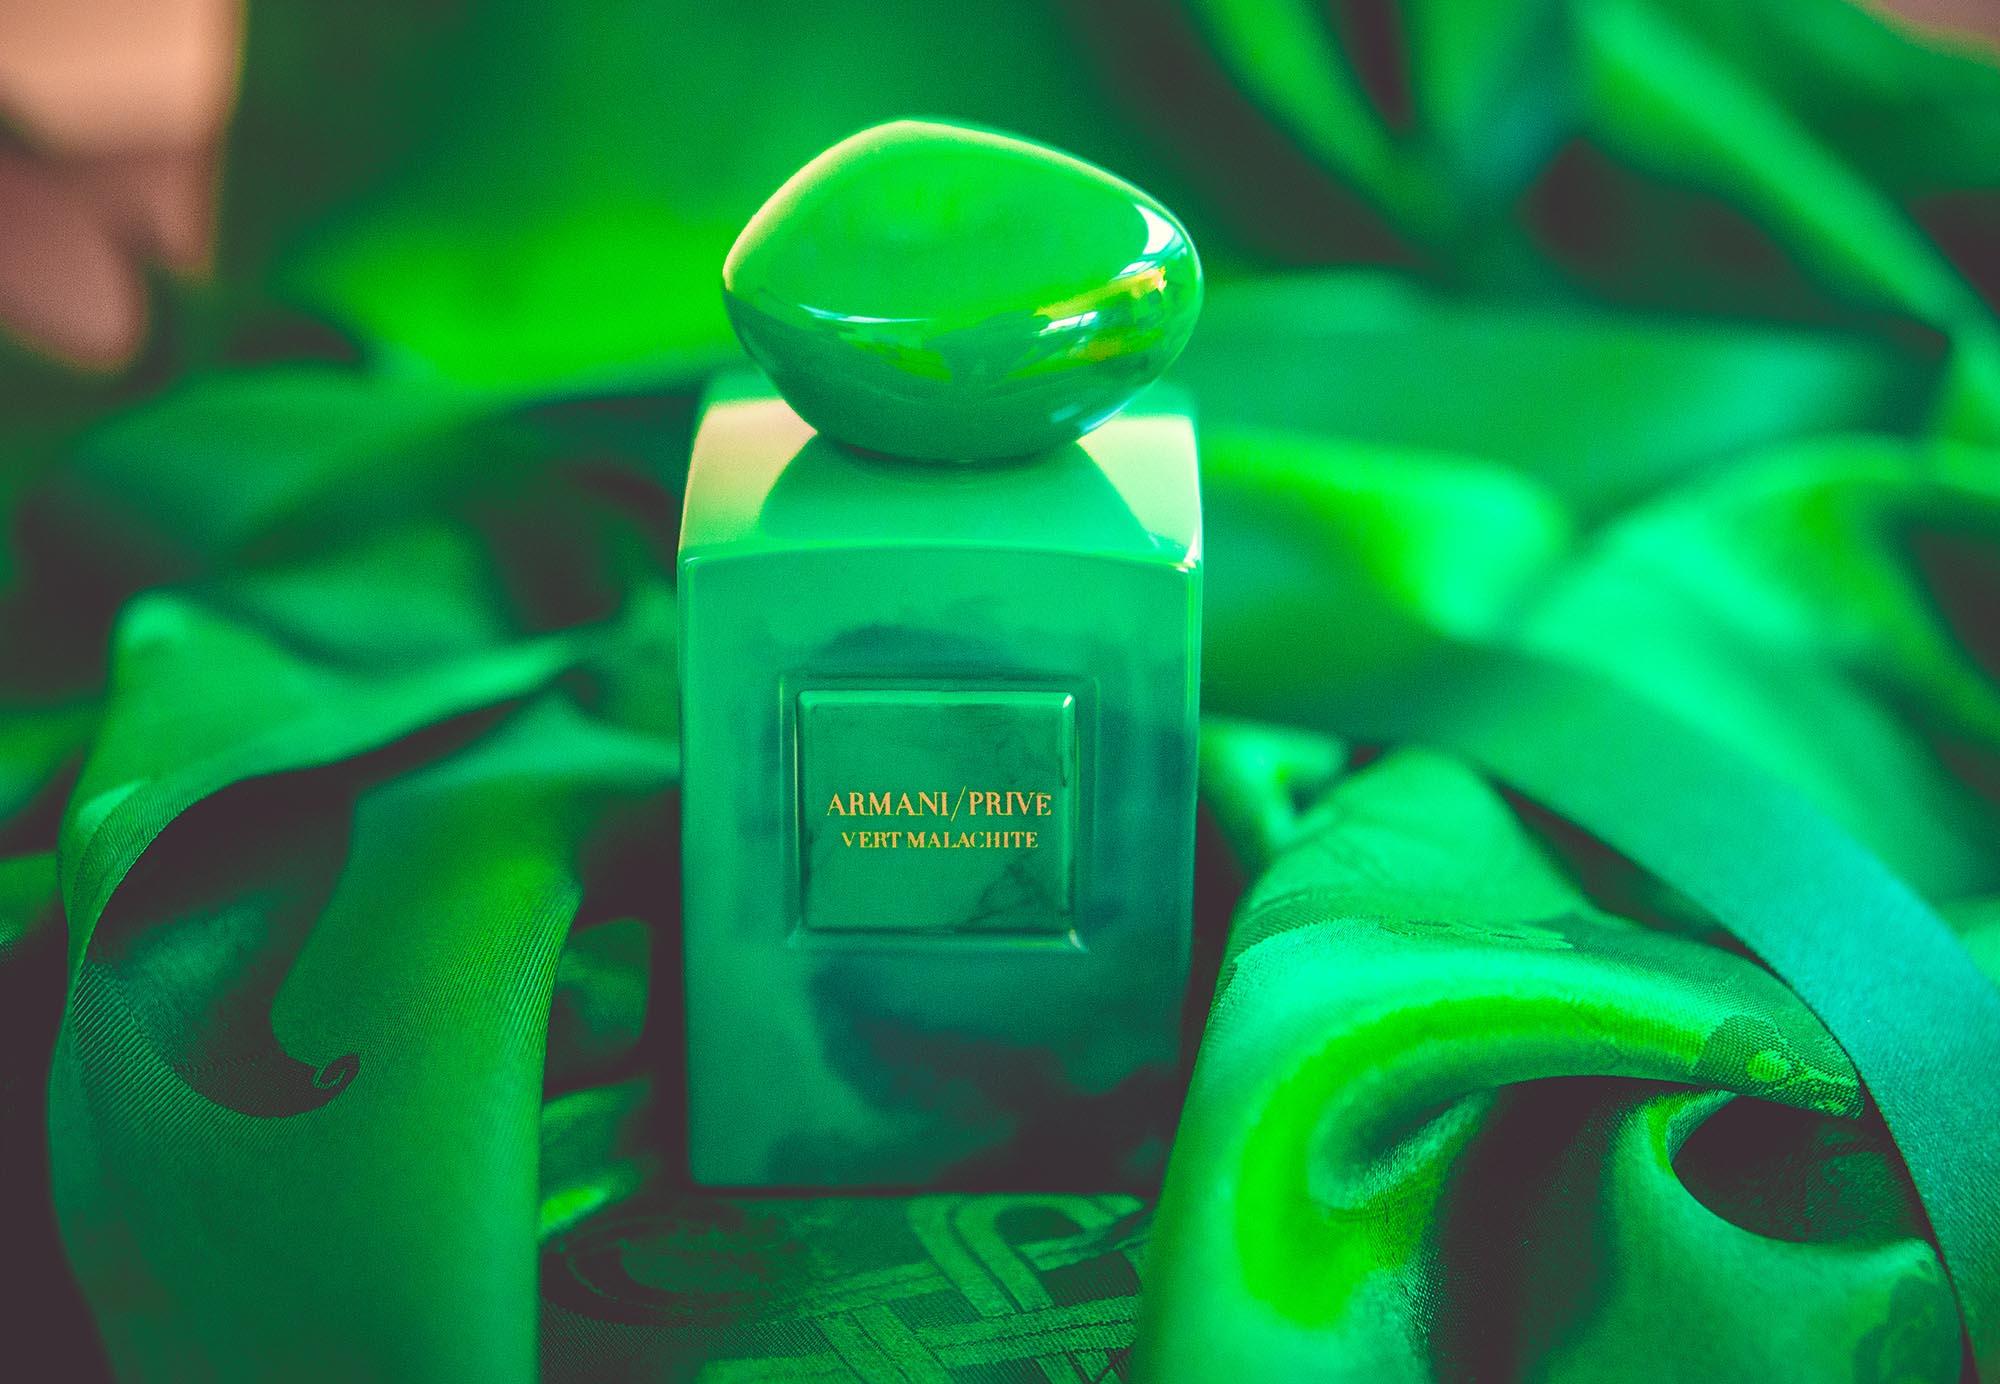 Vert Malachite Armani Prive: русский камень и южные цветы